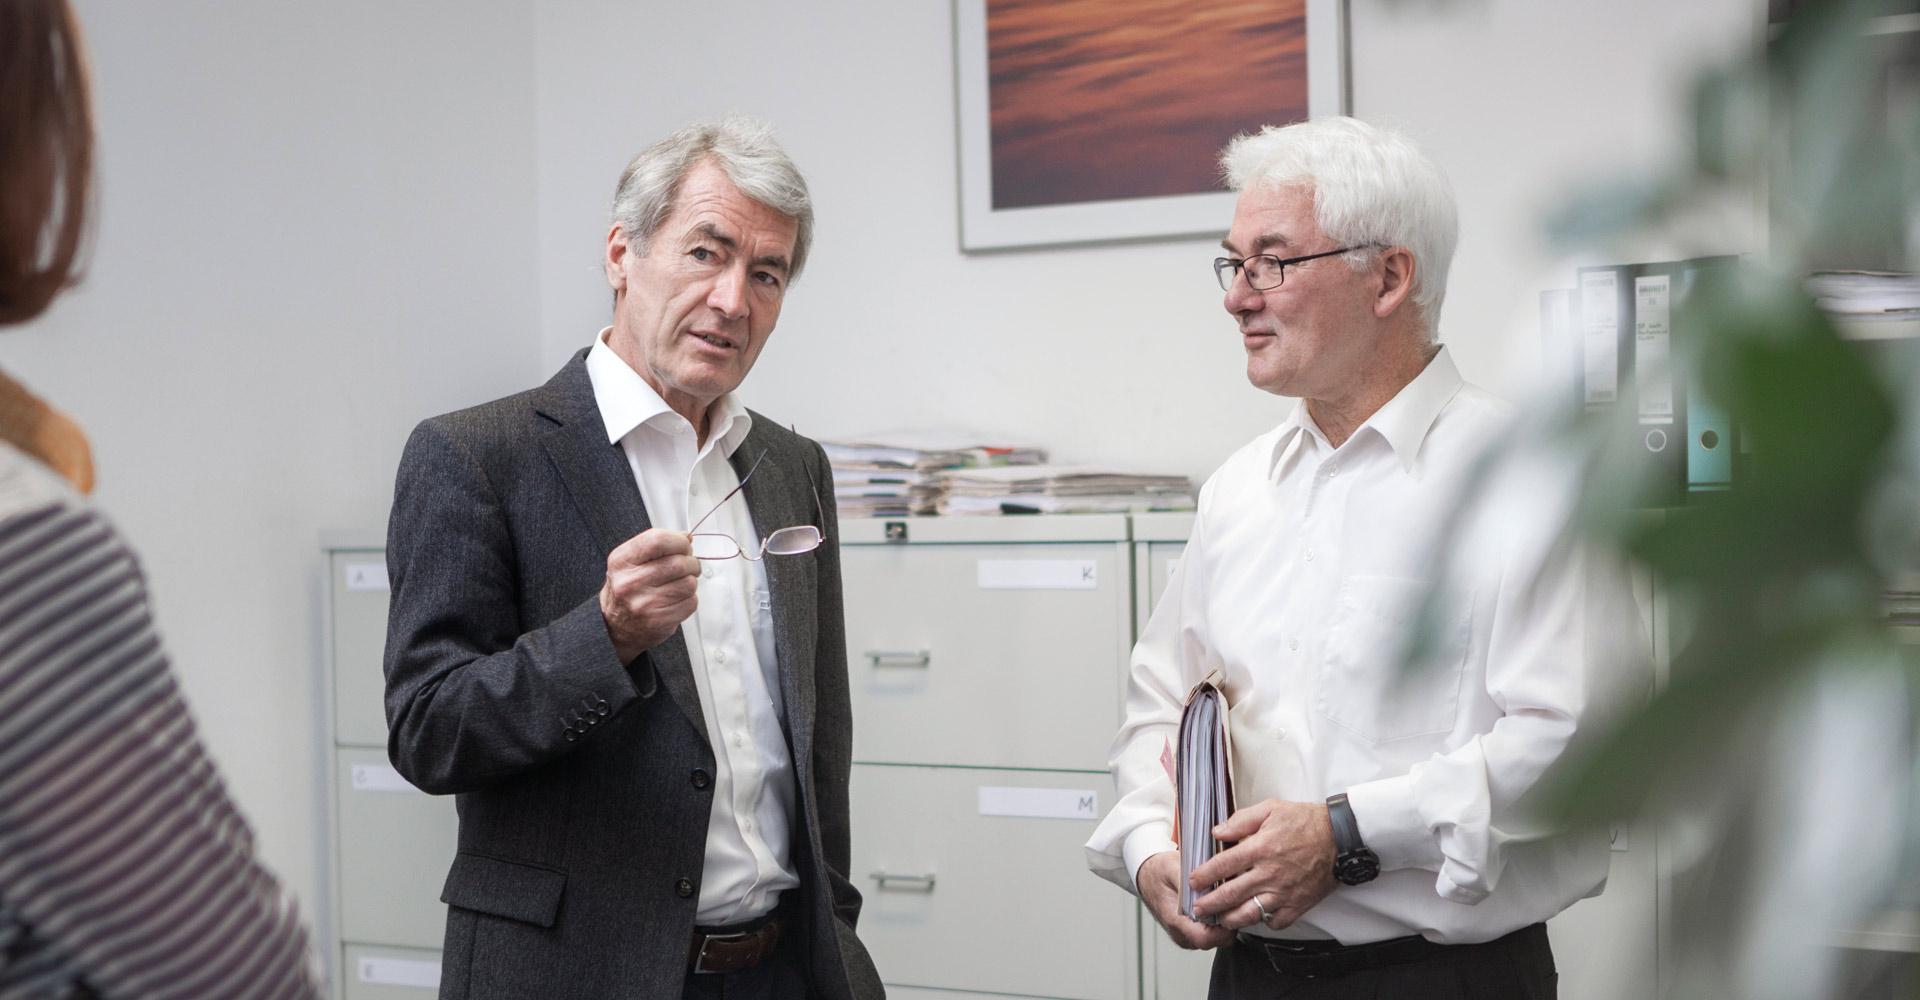 Kanzlei Mansholt Lodzik Klimaschewski Raane Cornelius